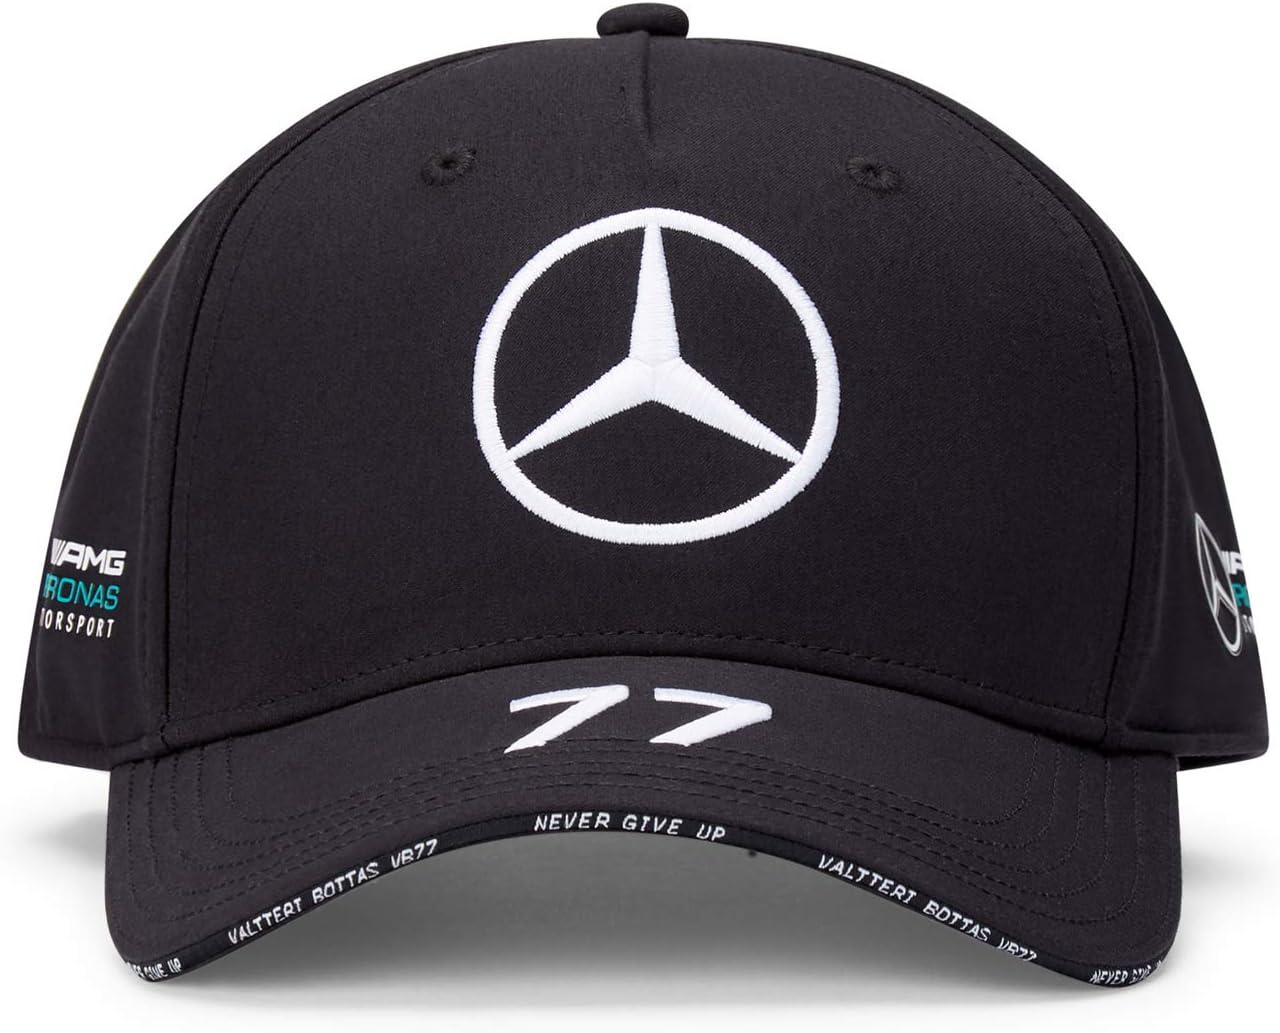 MAMGP Valtteri Bottas F1 Cap Official 2020 Range by Mercedes-AMG Formula One Team